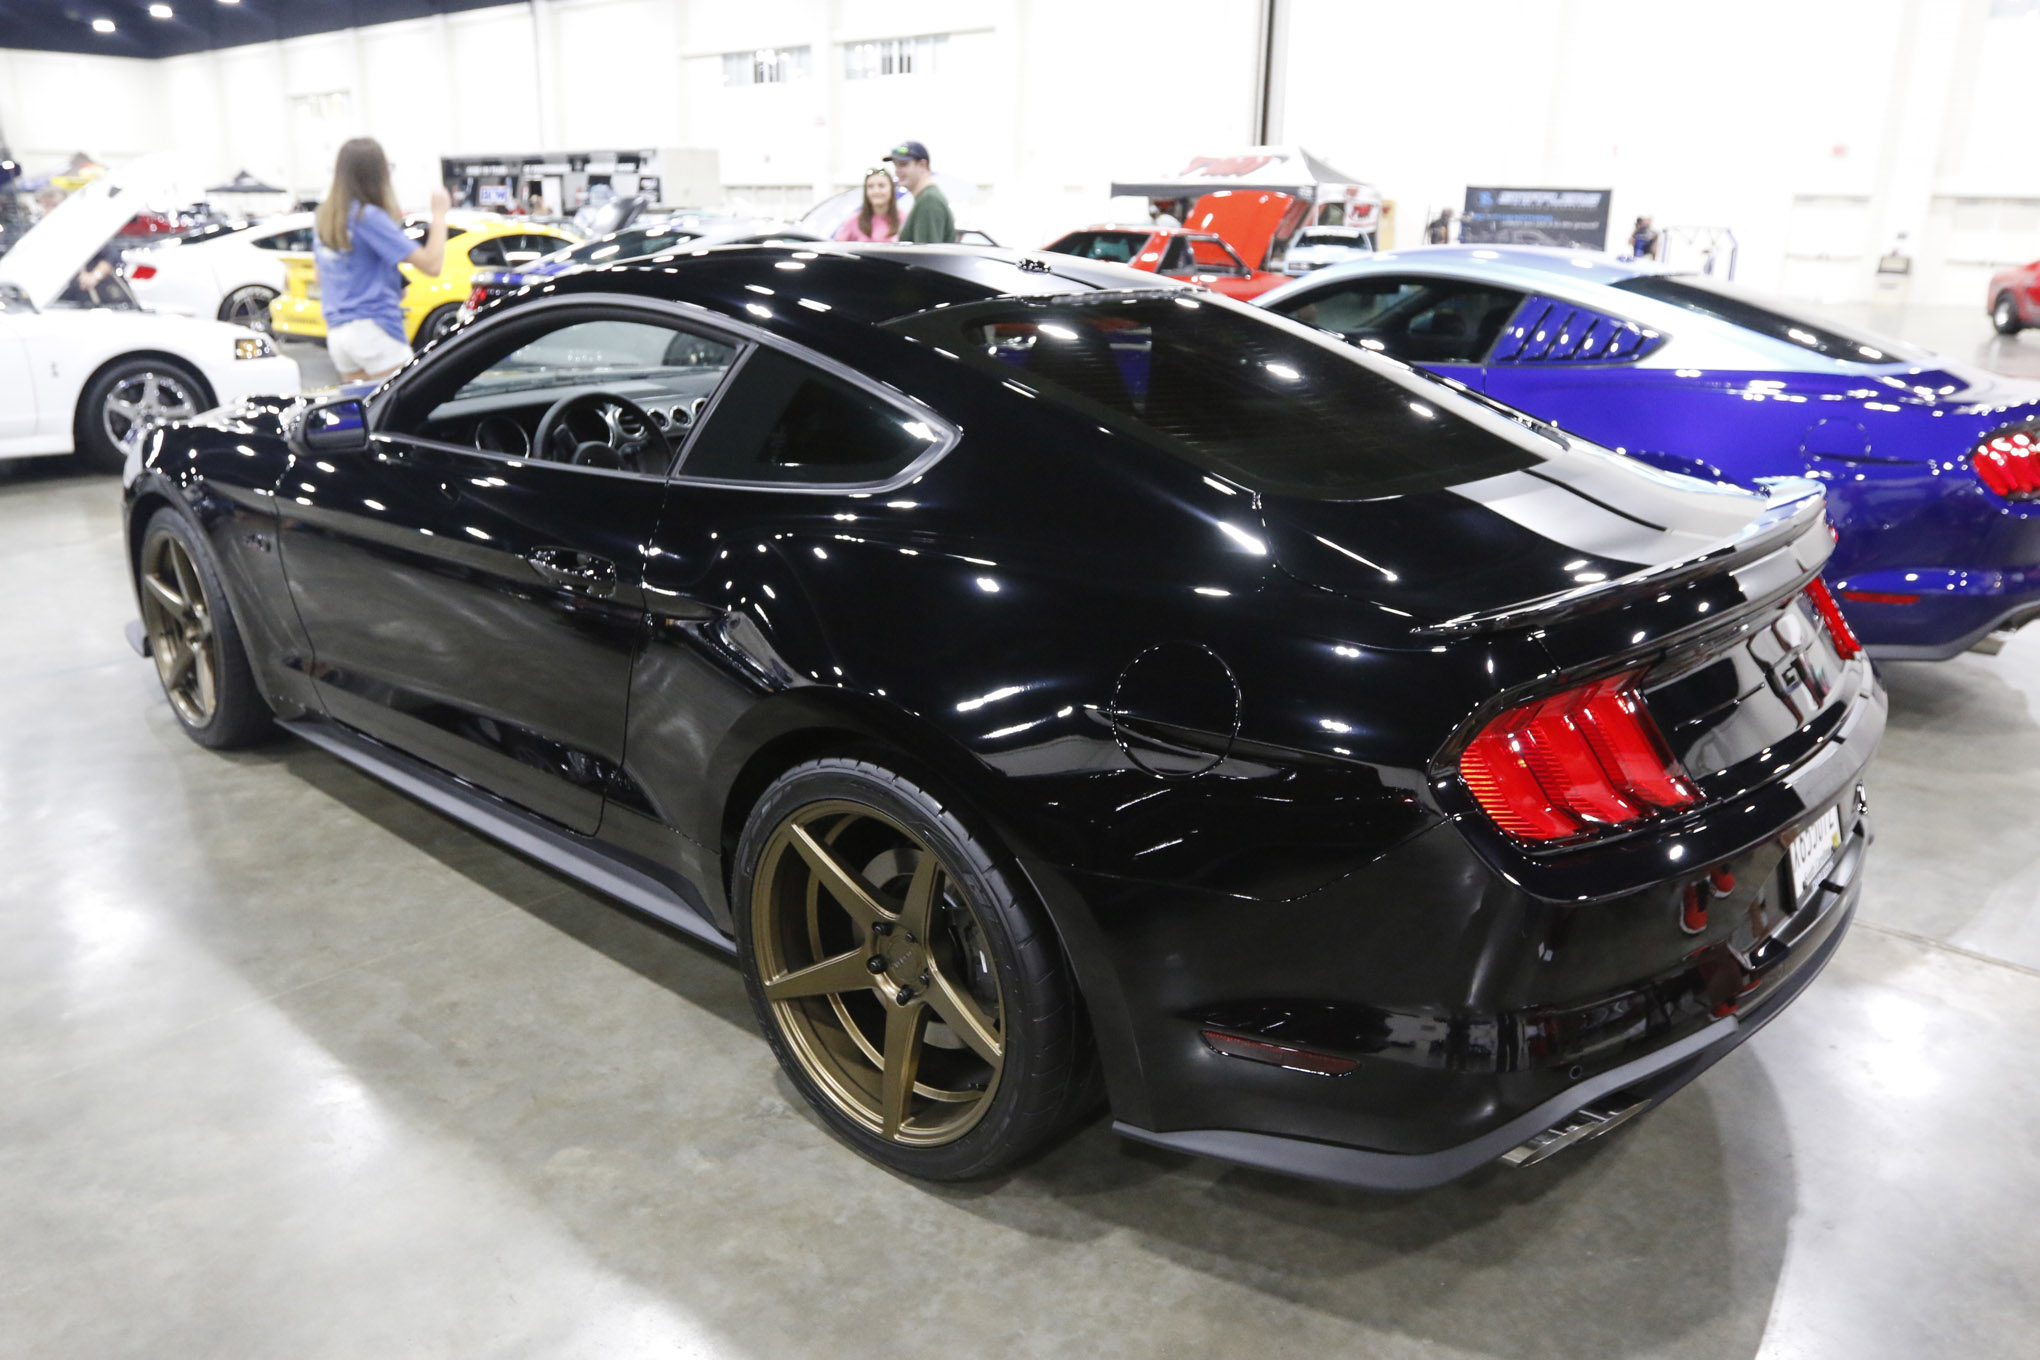 05 2018 Mustang Week Edition Mustang Fastback Rear